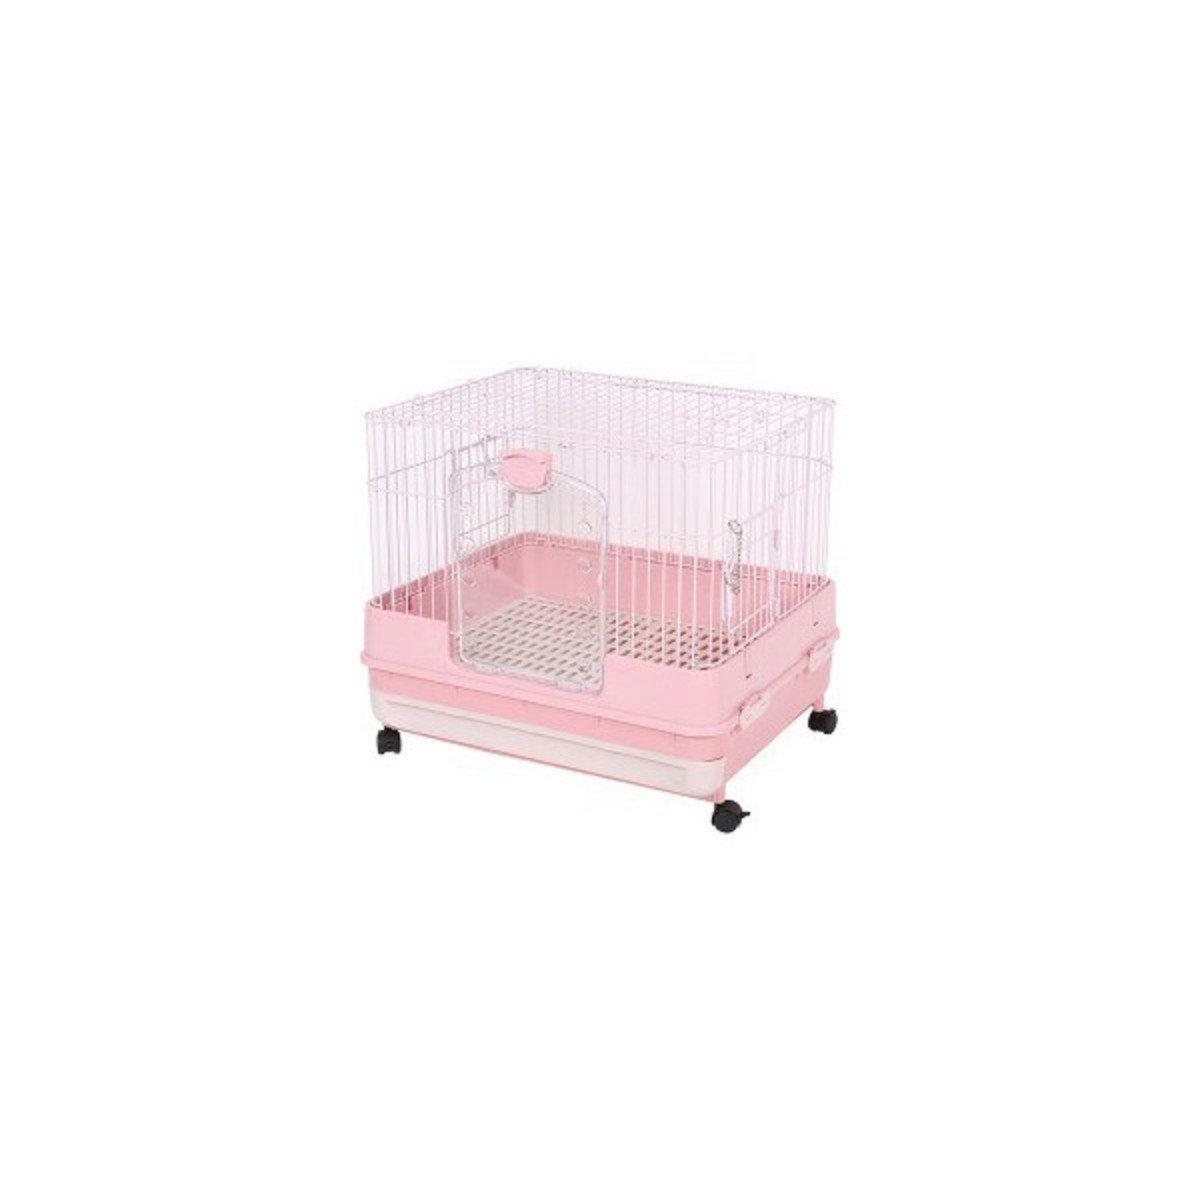 MR-995抽屜式兔籠粉紅色H50cm